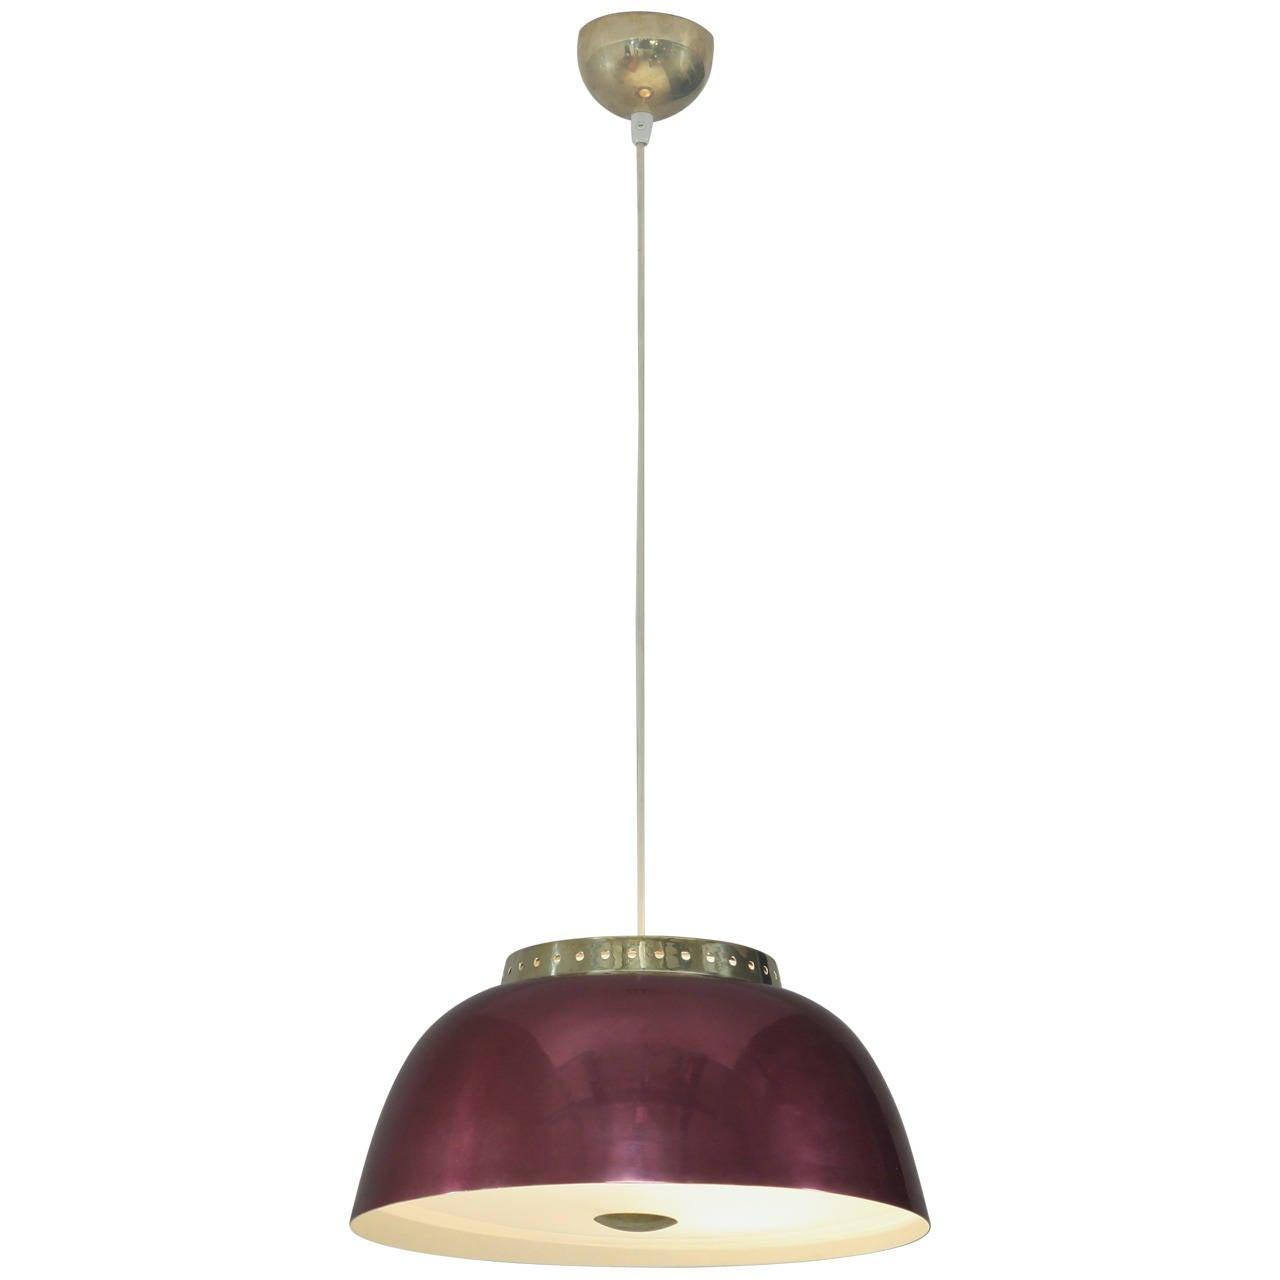 Lisa Johansson-Pape Burgundy Pendant Lamp, Orno, Finland, 1950s